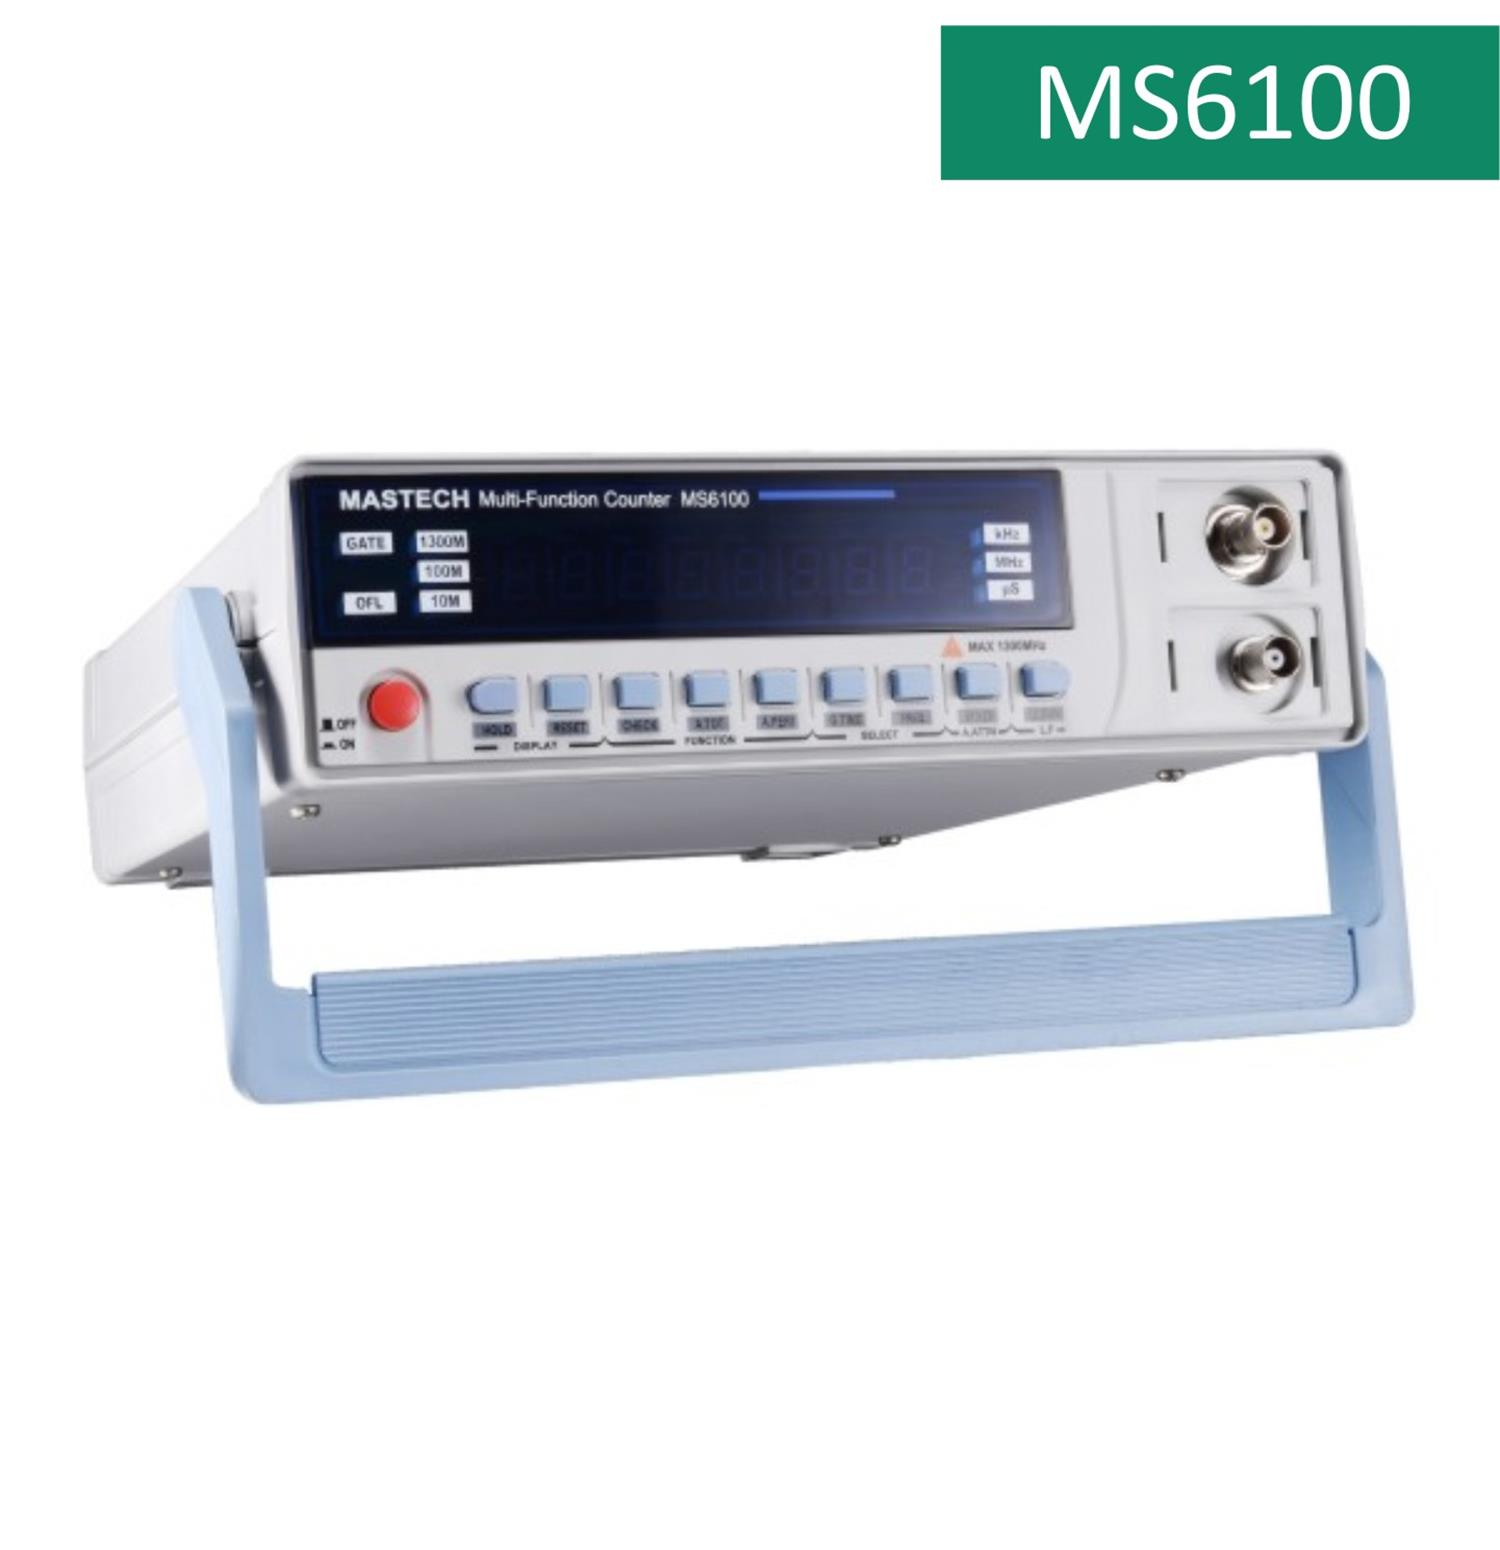 MS6100